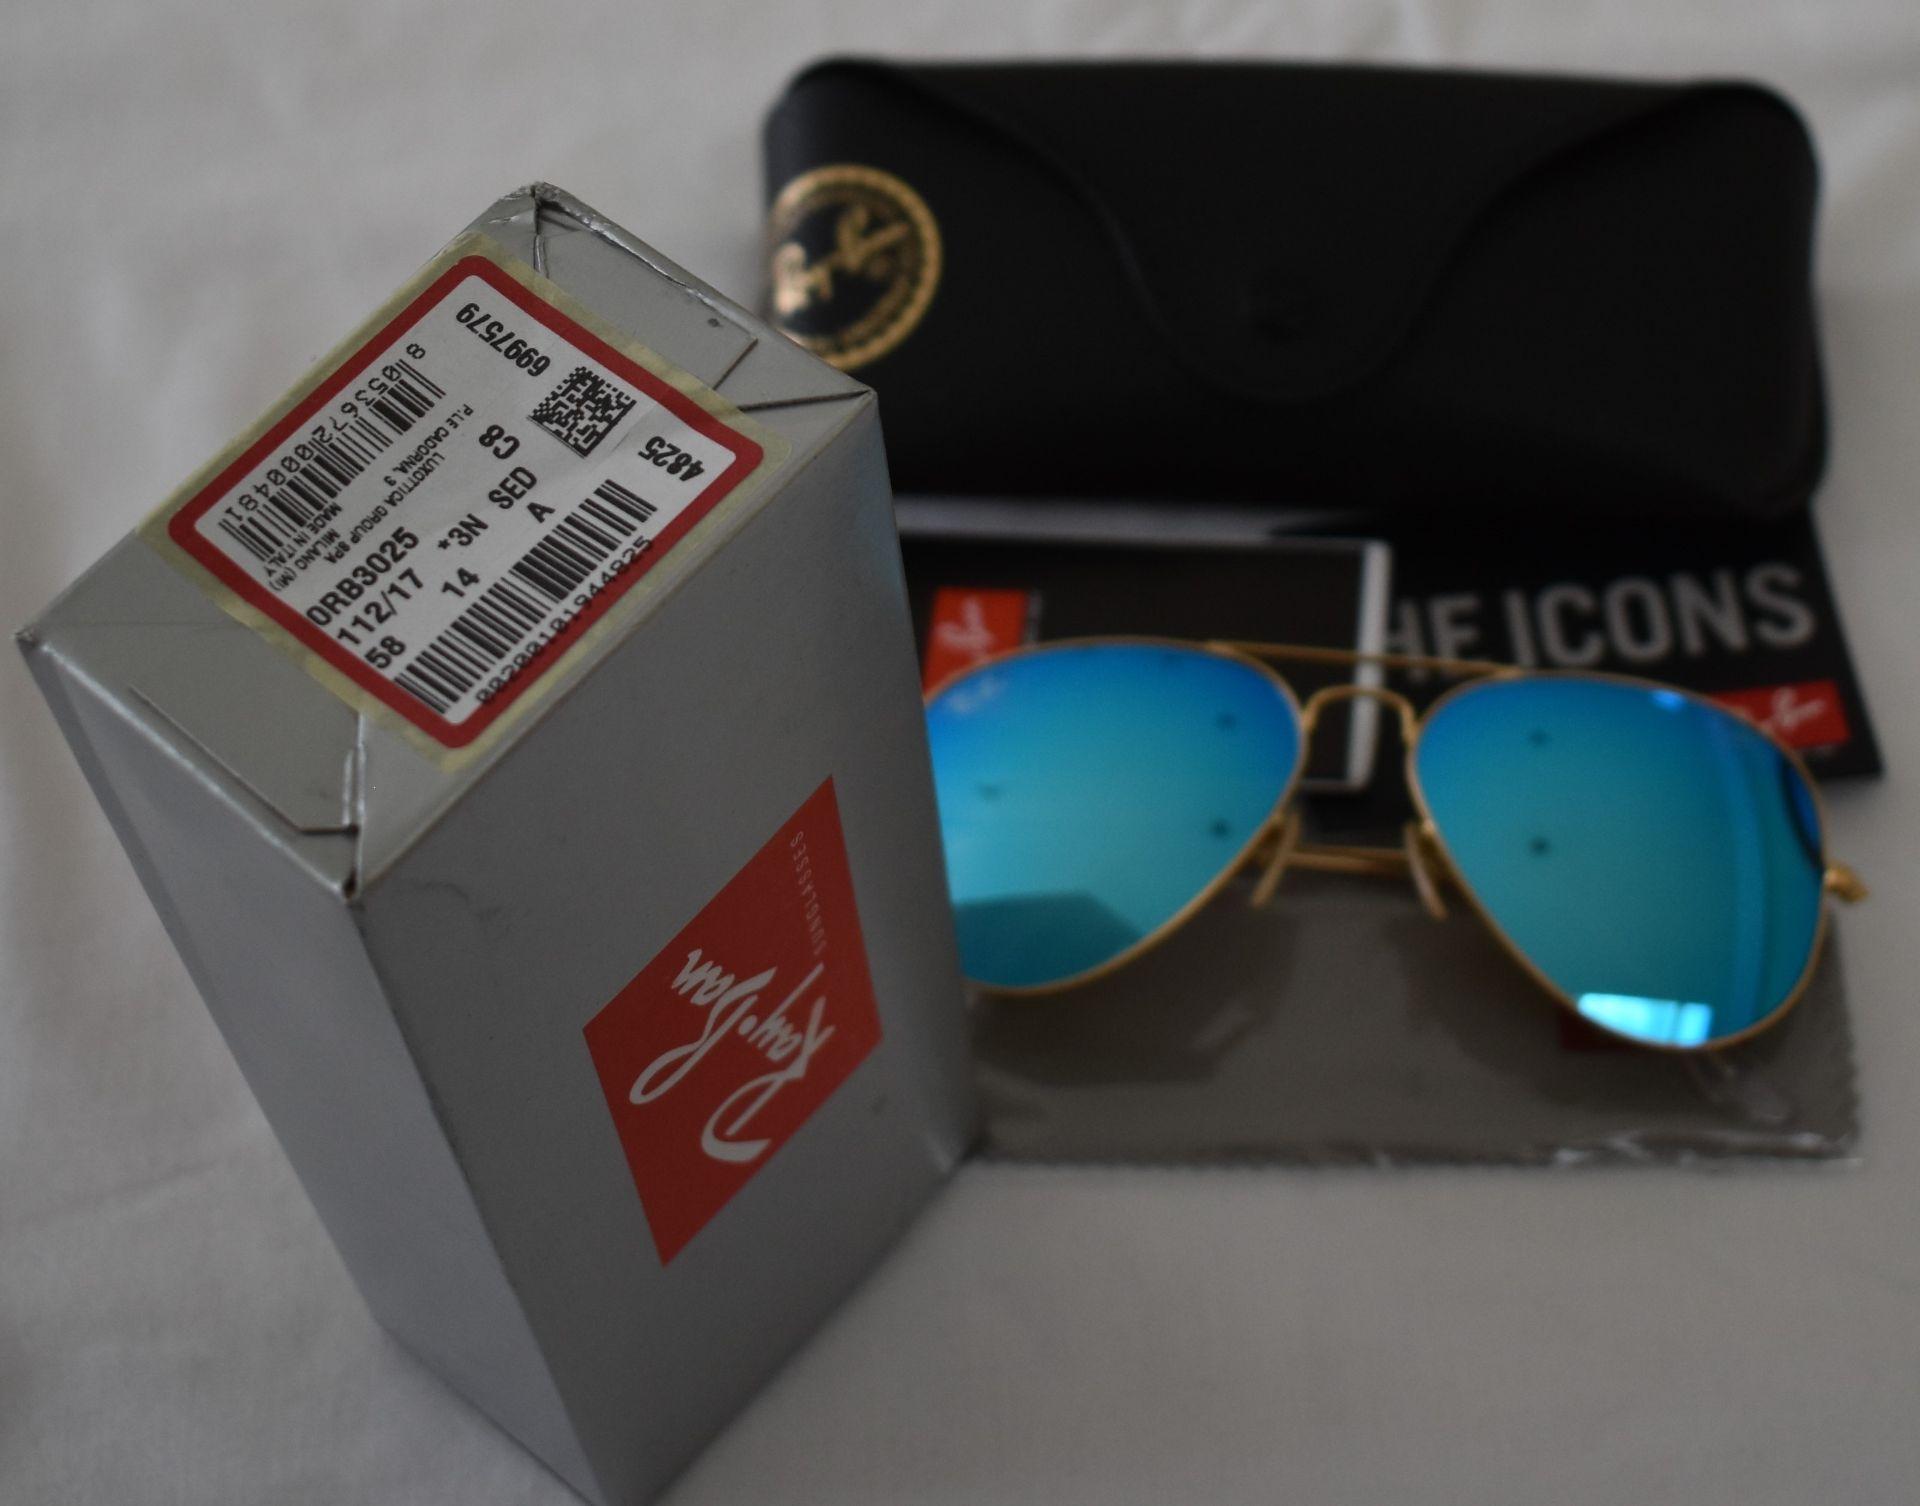 Ray Ban Sunglasses ORB3025 112/17 *3N - Image 2 of 2